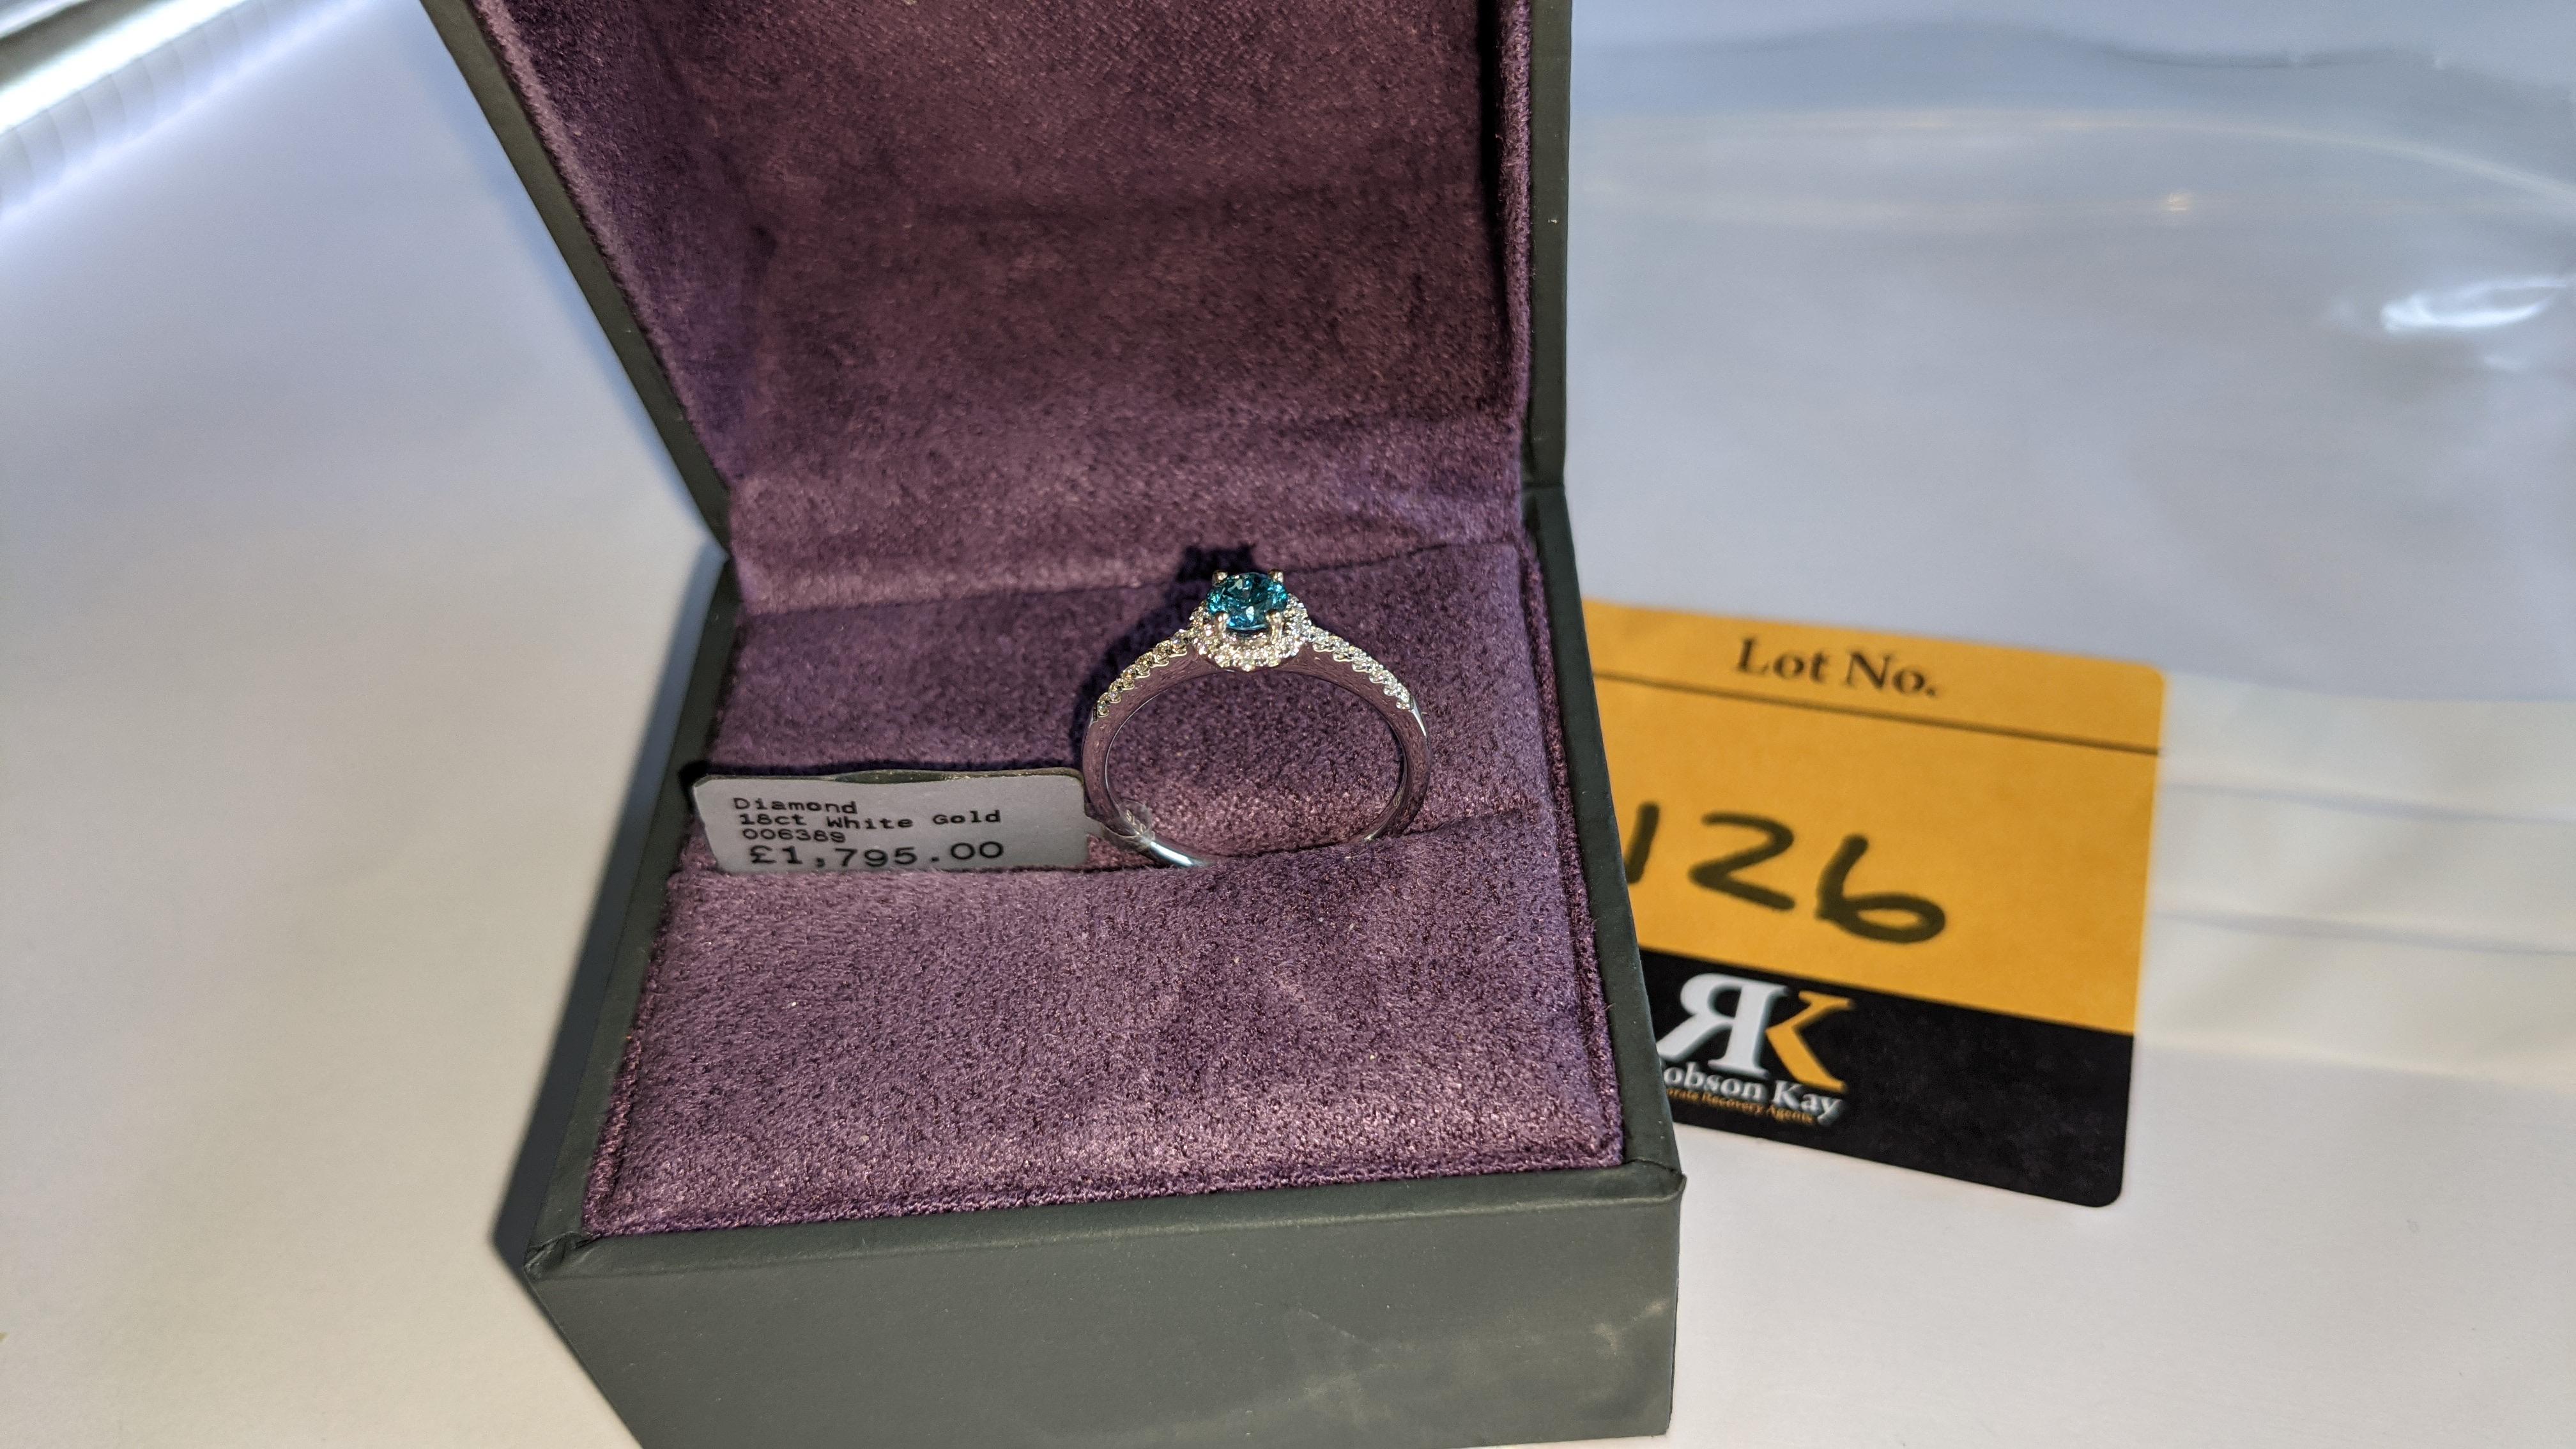 18ct white gold & diamond ring with 0.30ct blue diamond & 0.1ct of additional diamonds around the ce